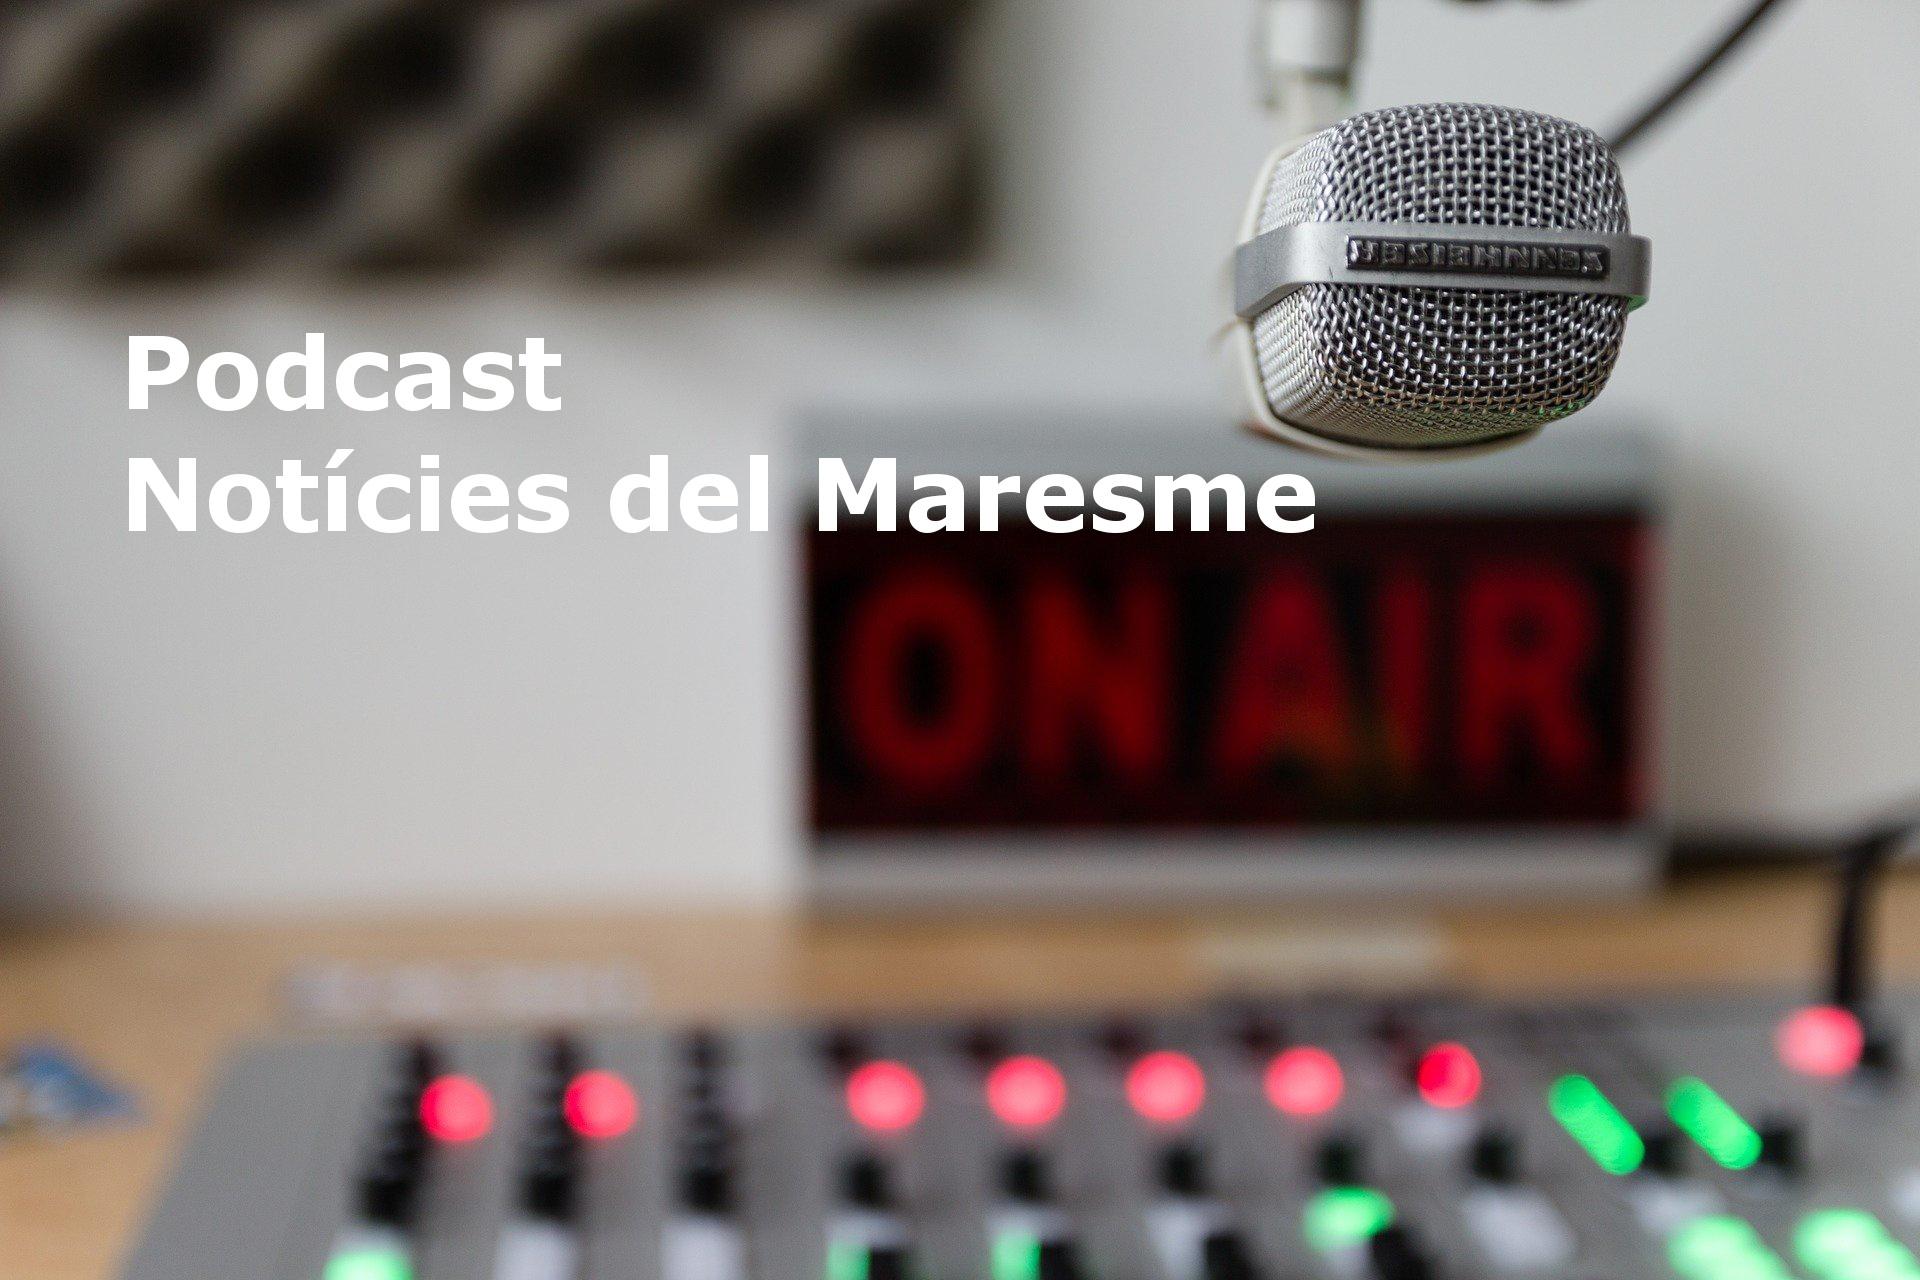 Podcast del Maresme